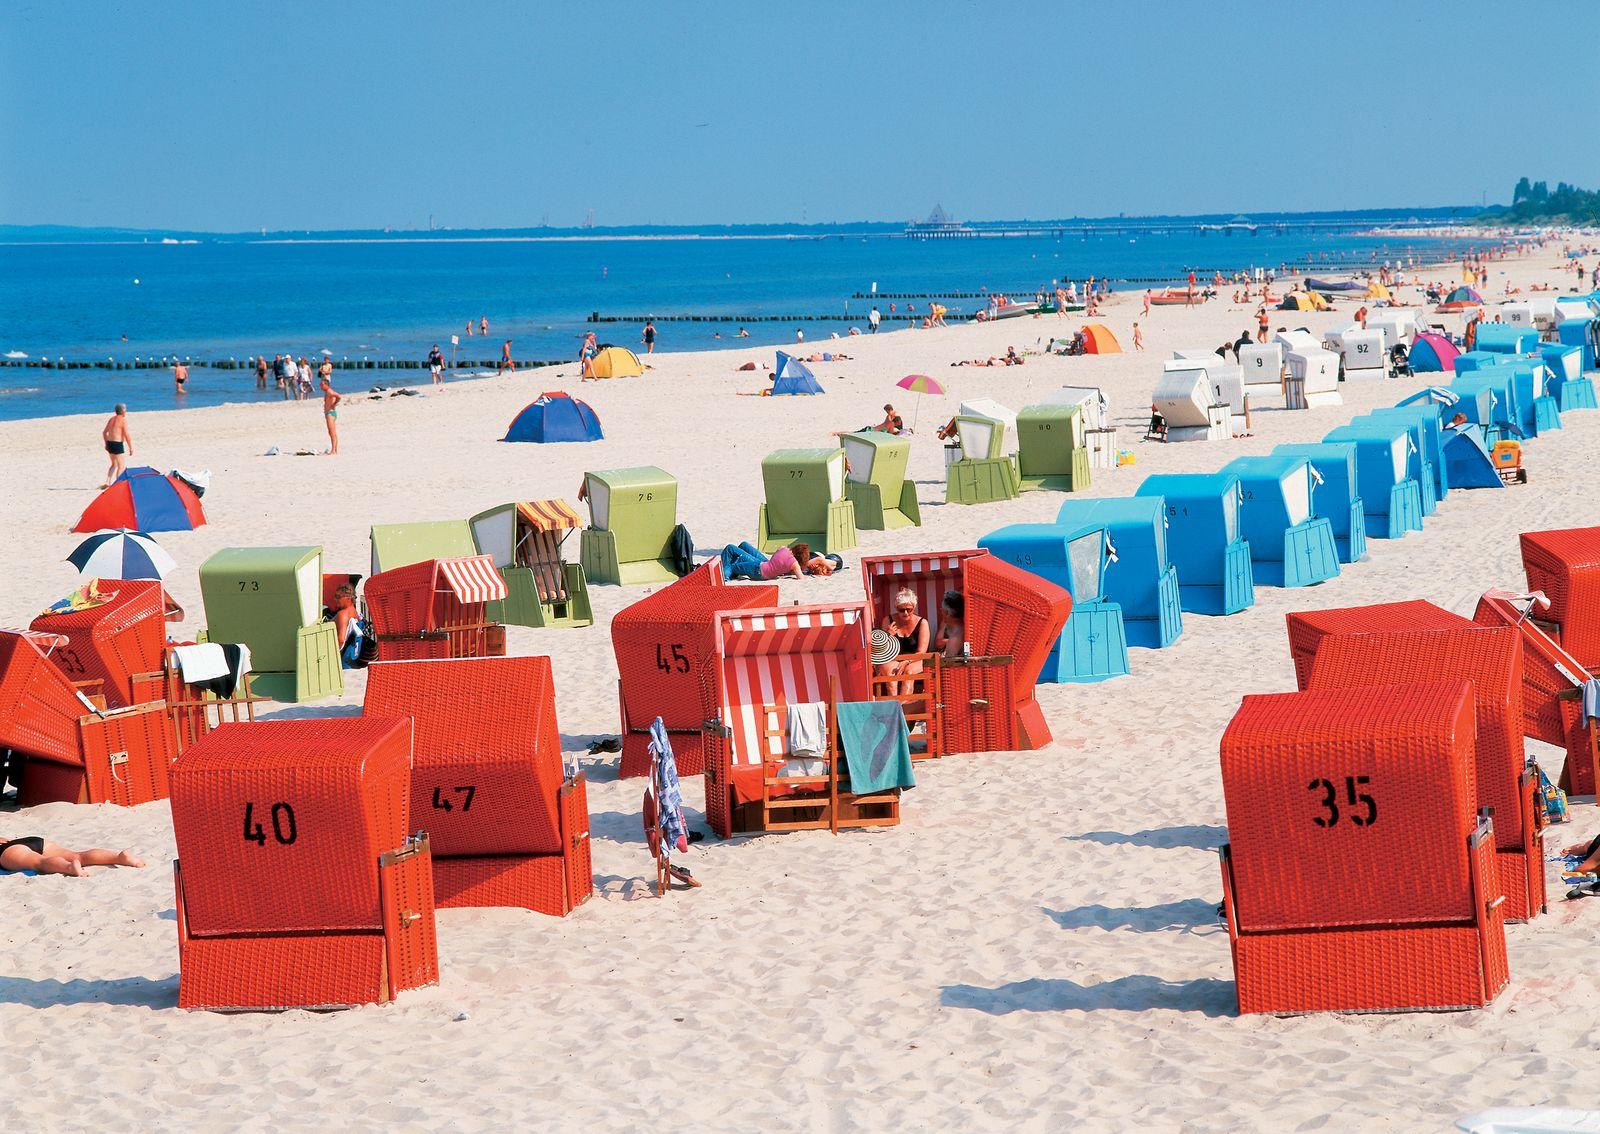 Germany beach orgy photo 58